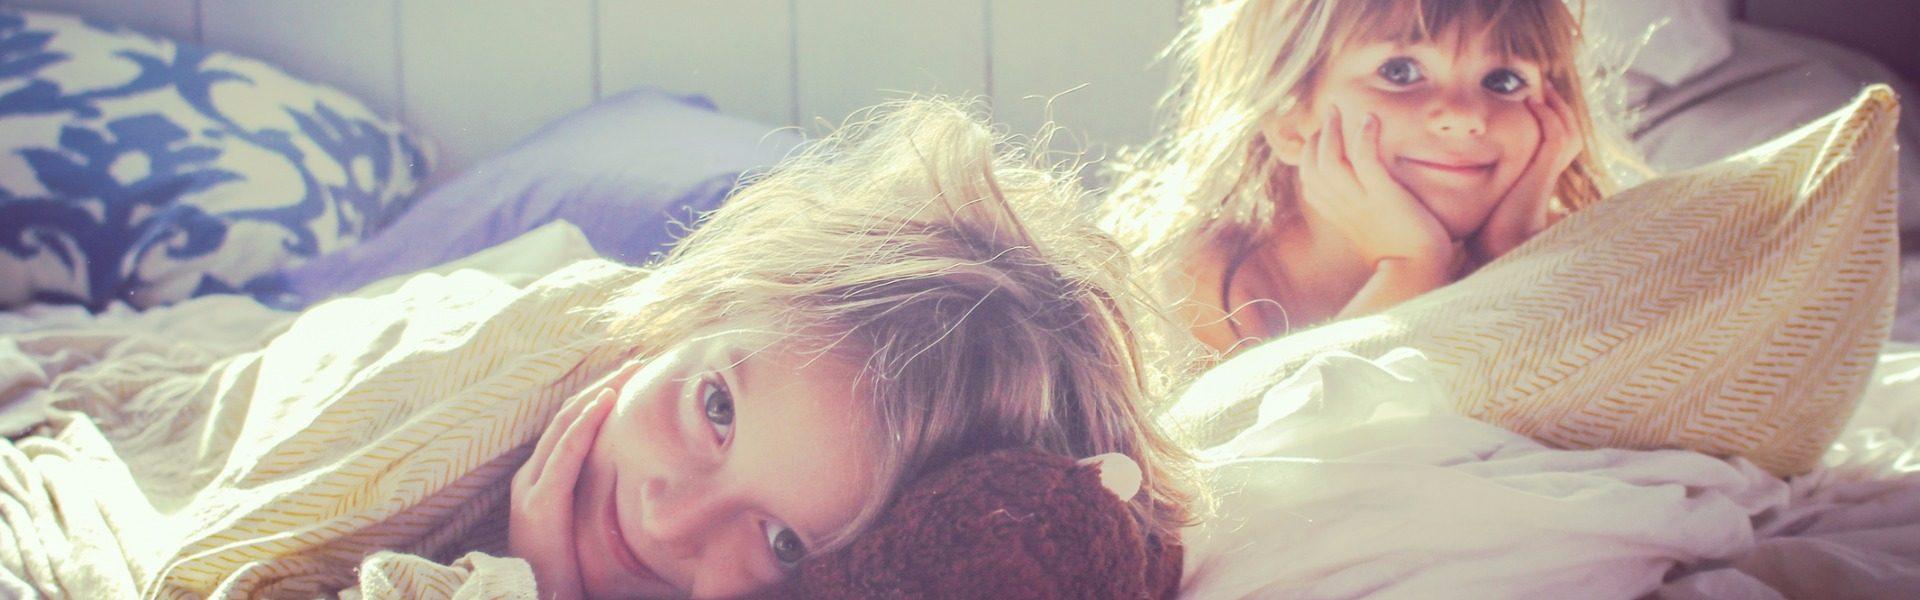 sleep tips for kids - mercy health